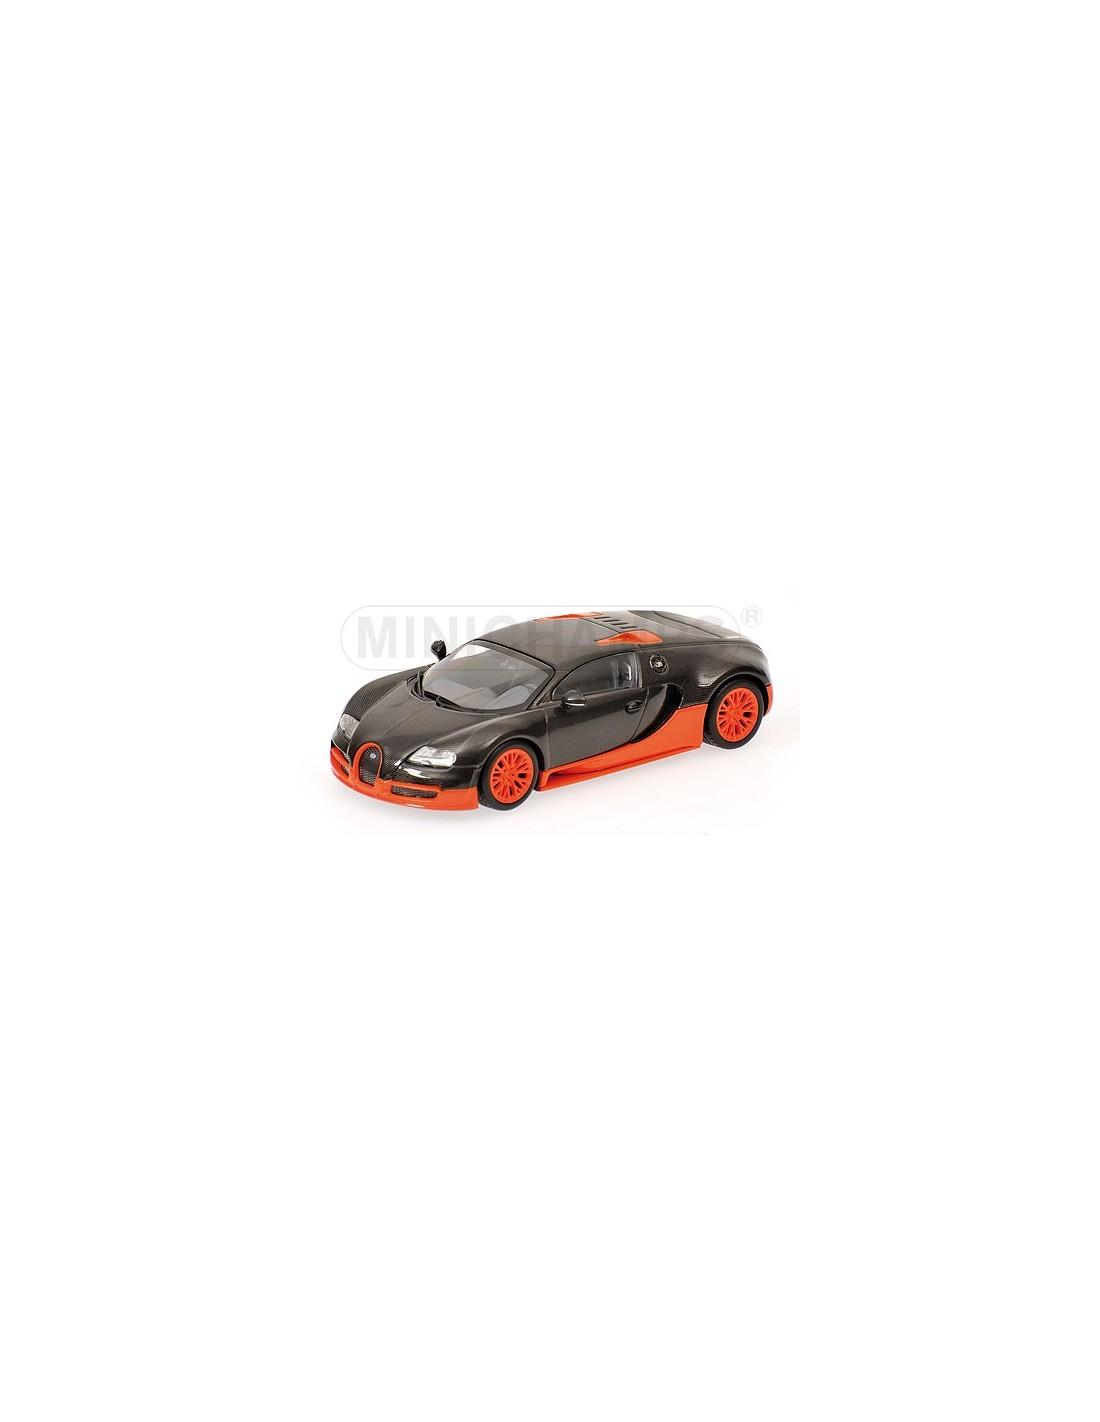 minichamps bugatti veyron super sport 2010 carbon orange world record. Black Bedroom Furniture Sets. Home Design Ideas